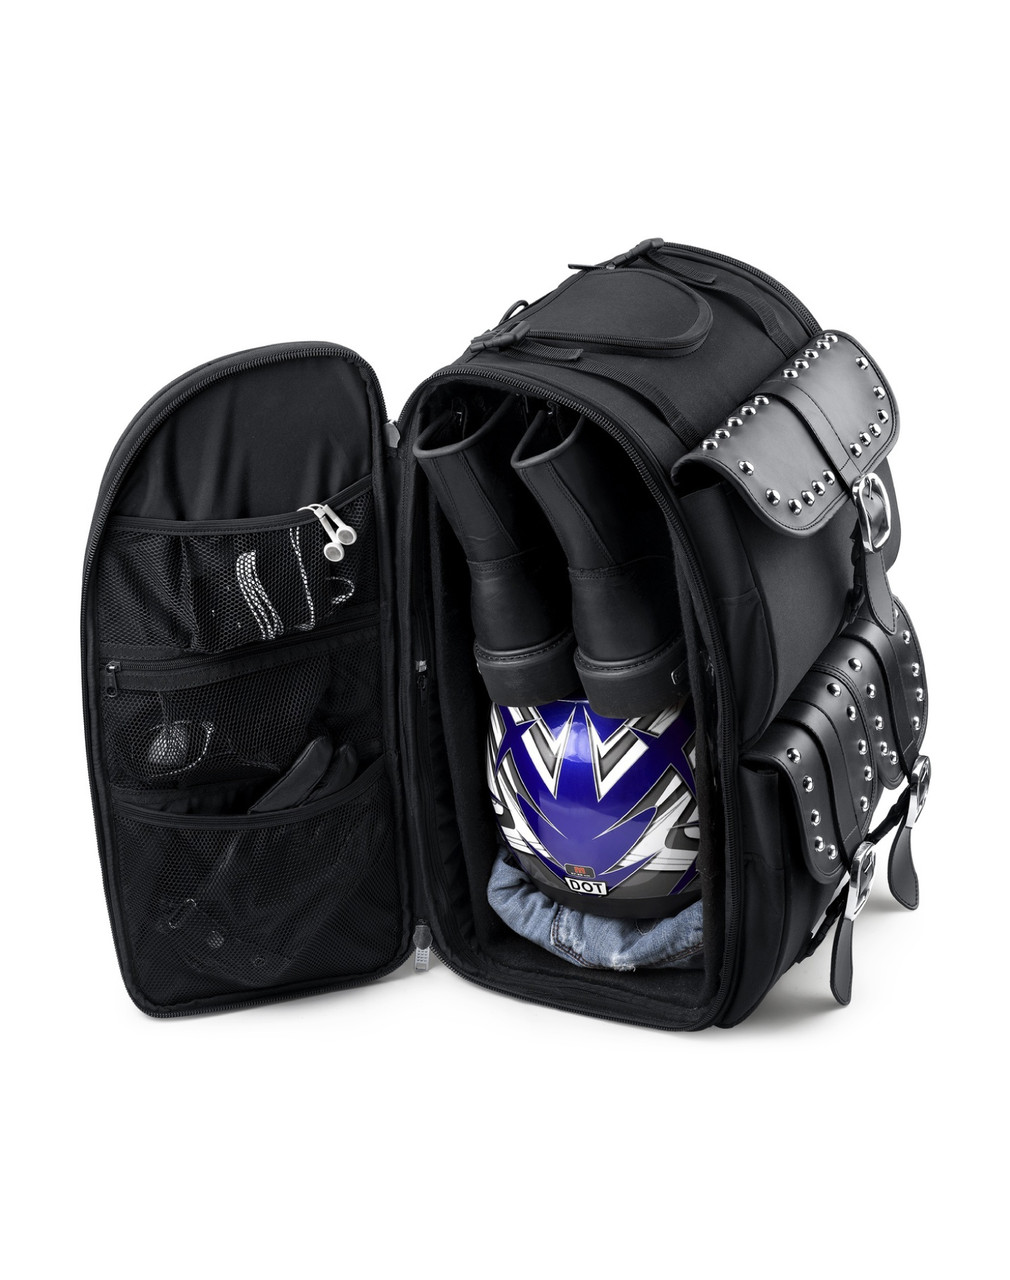 Honda Viking Extra Large Studded Motorcycle Sissy Bar Bag Storage View